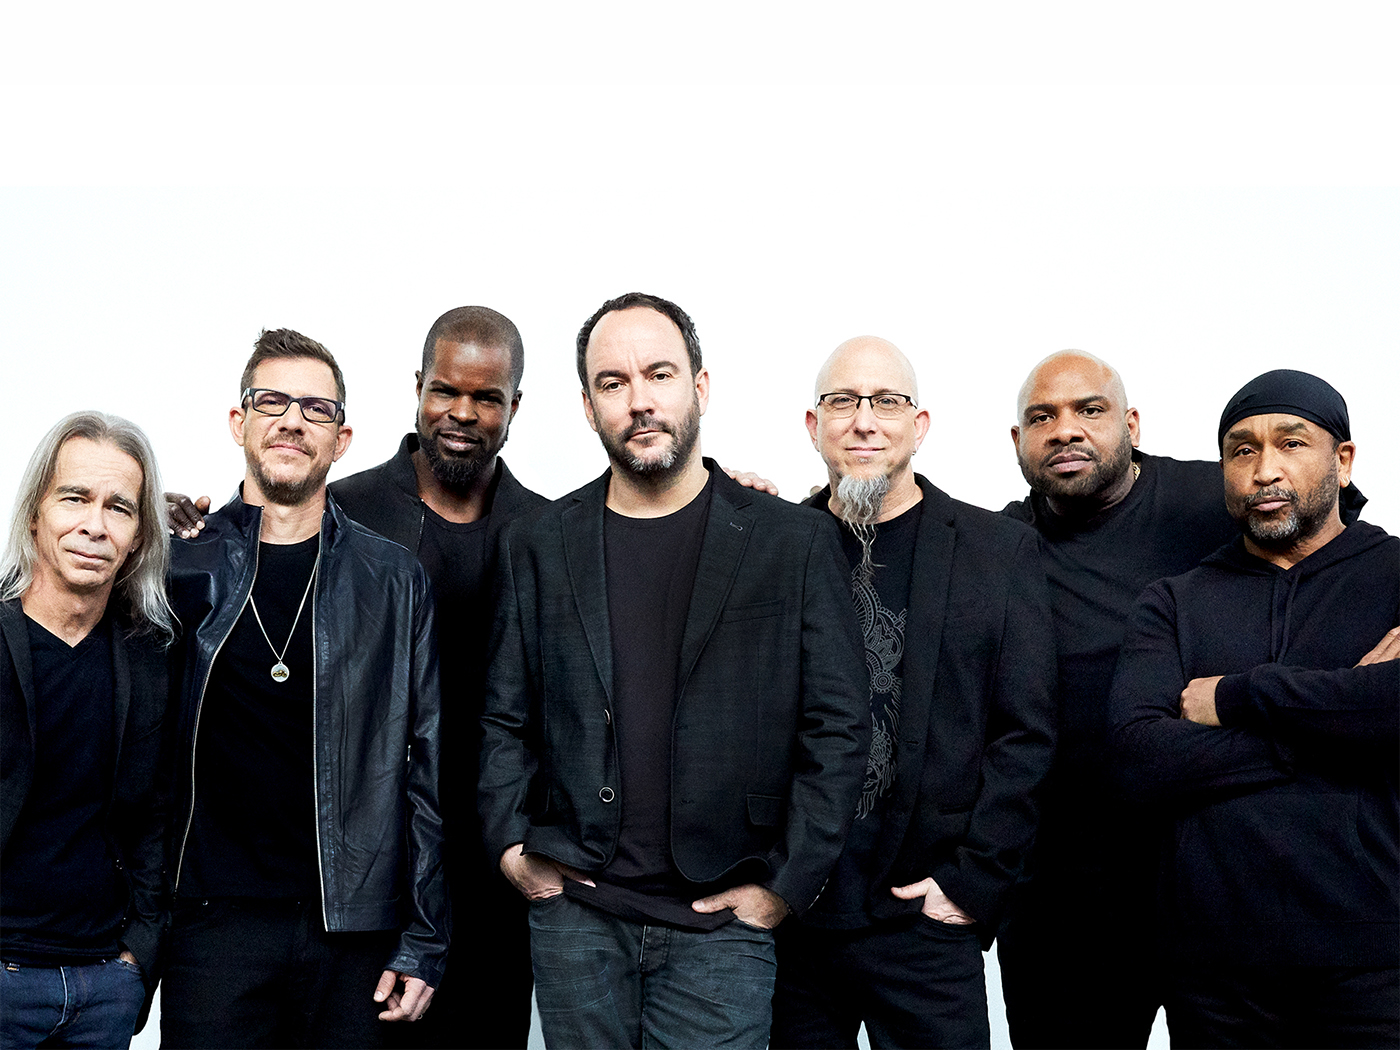 dave matthews band byron bay bluesfest 2020 headliners